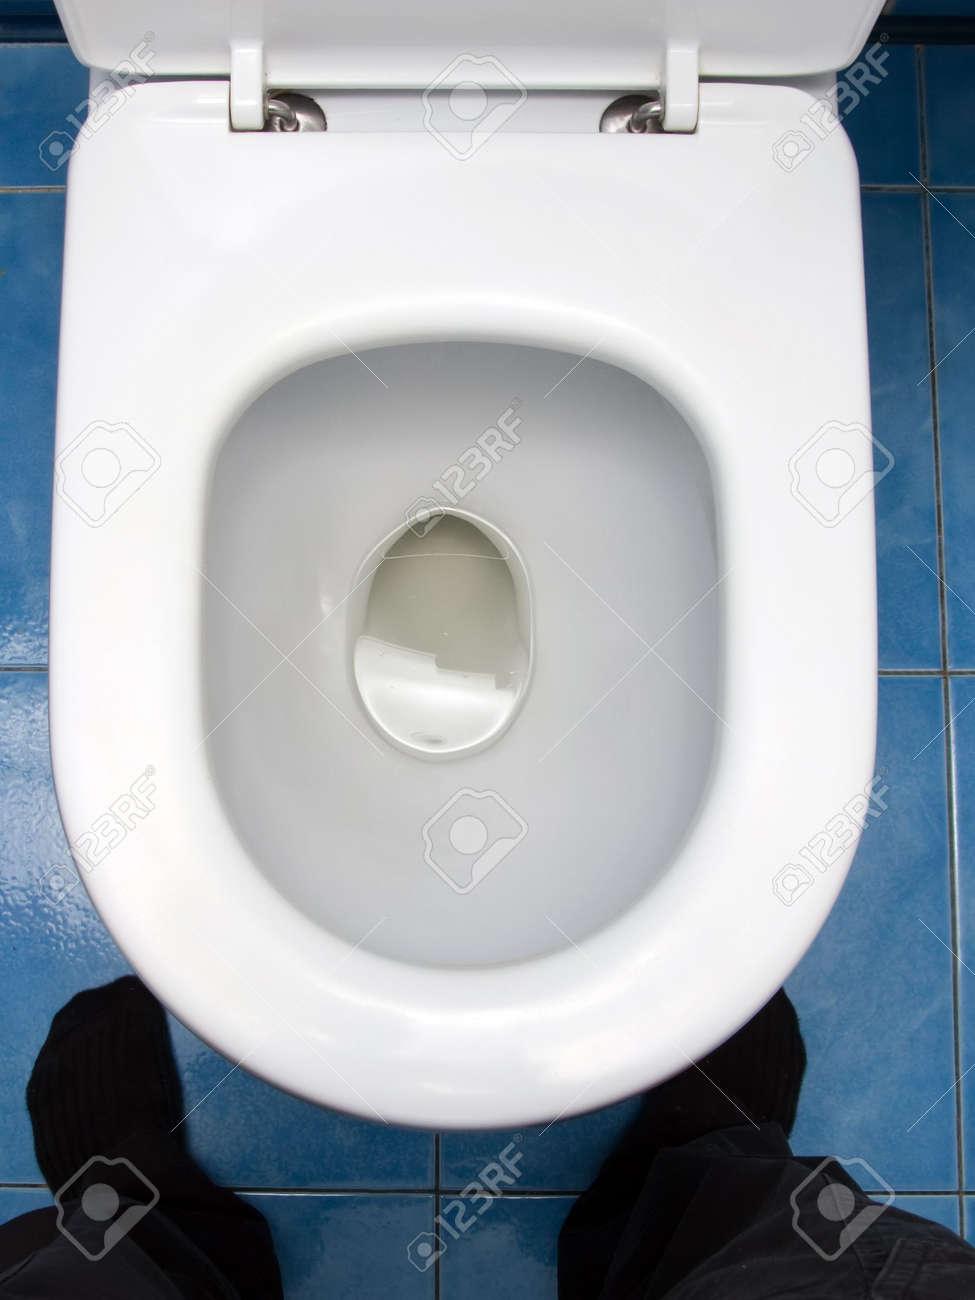 Home interior clean toilet sink bowl on tile floor Stock Photo - 5597110